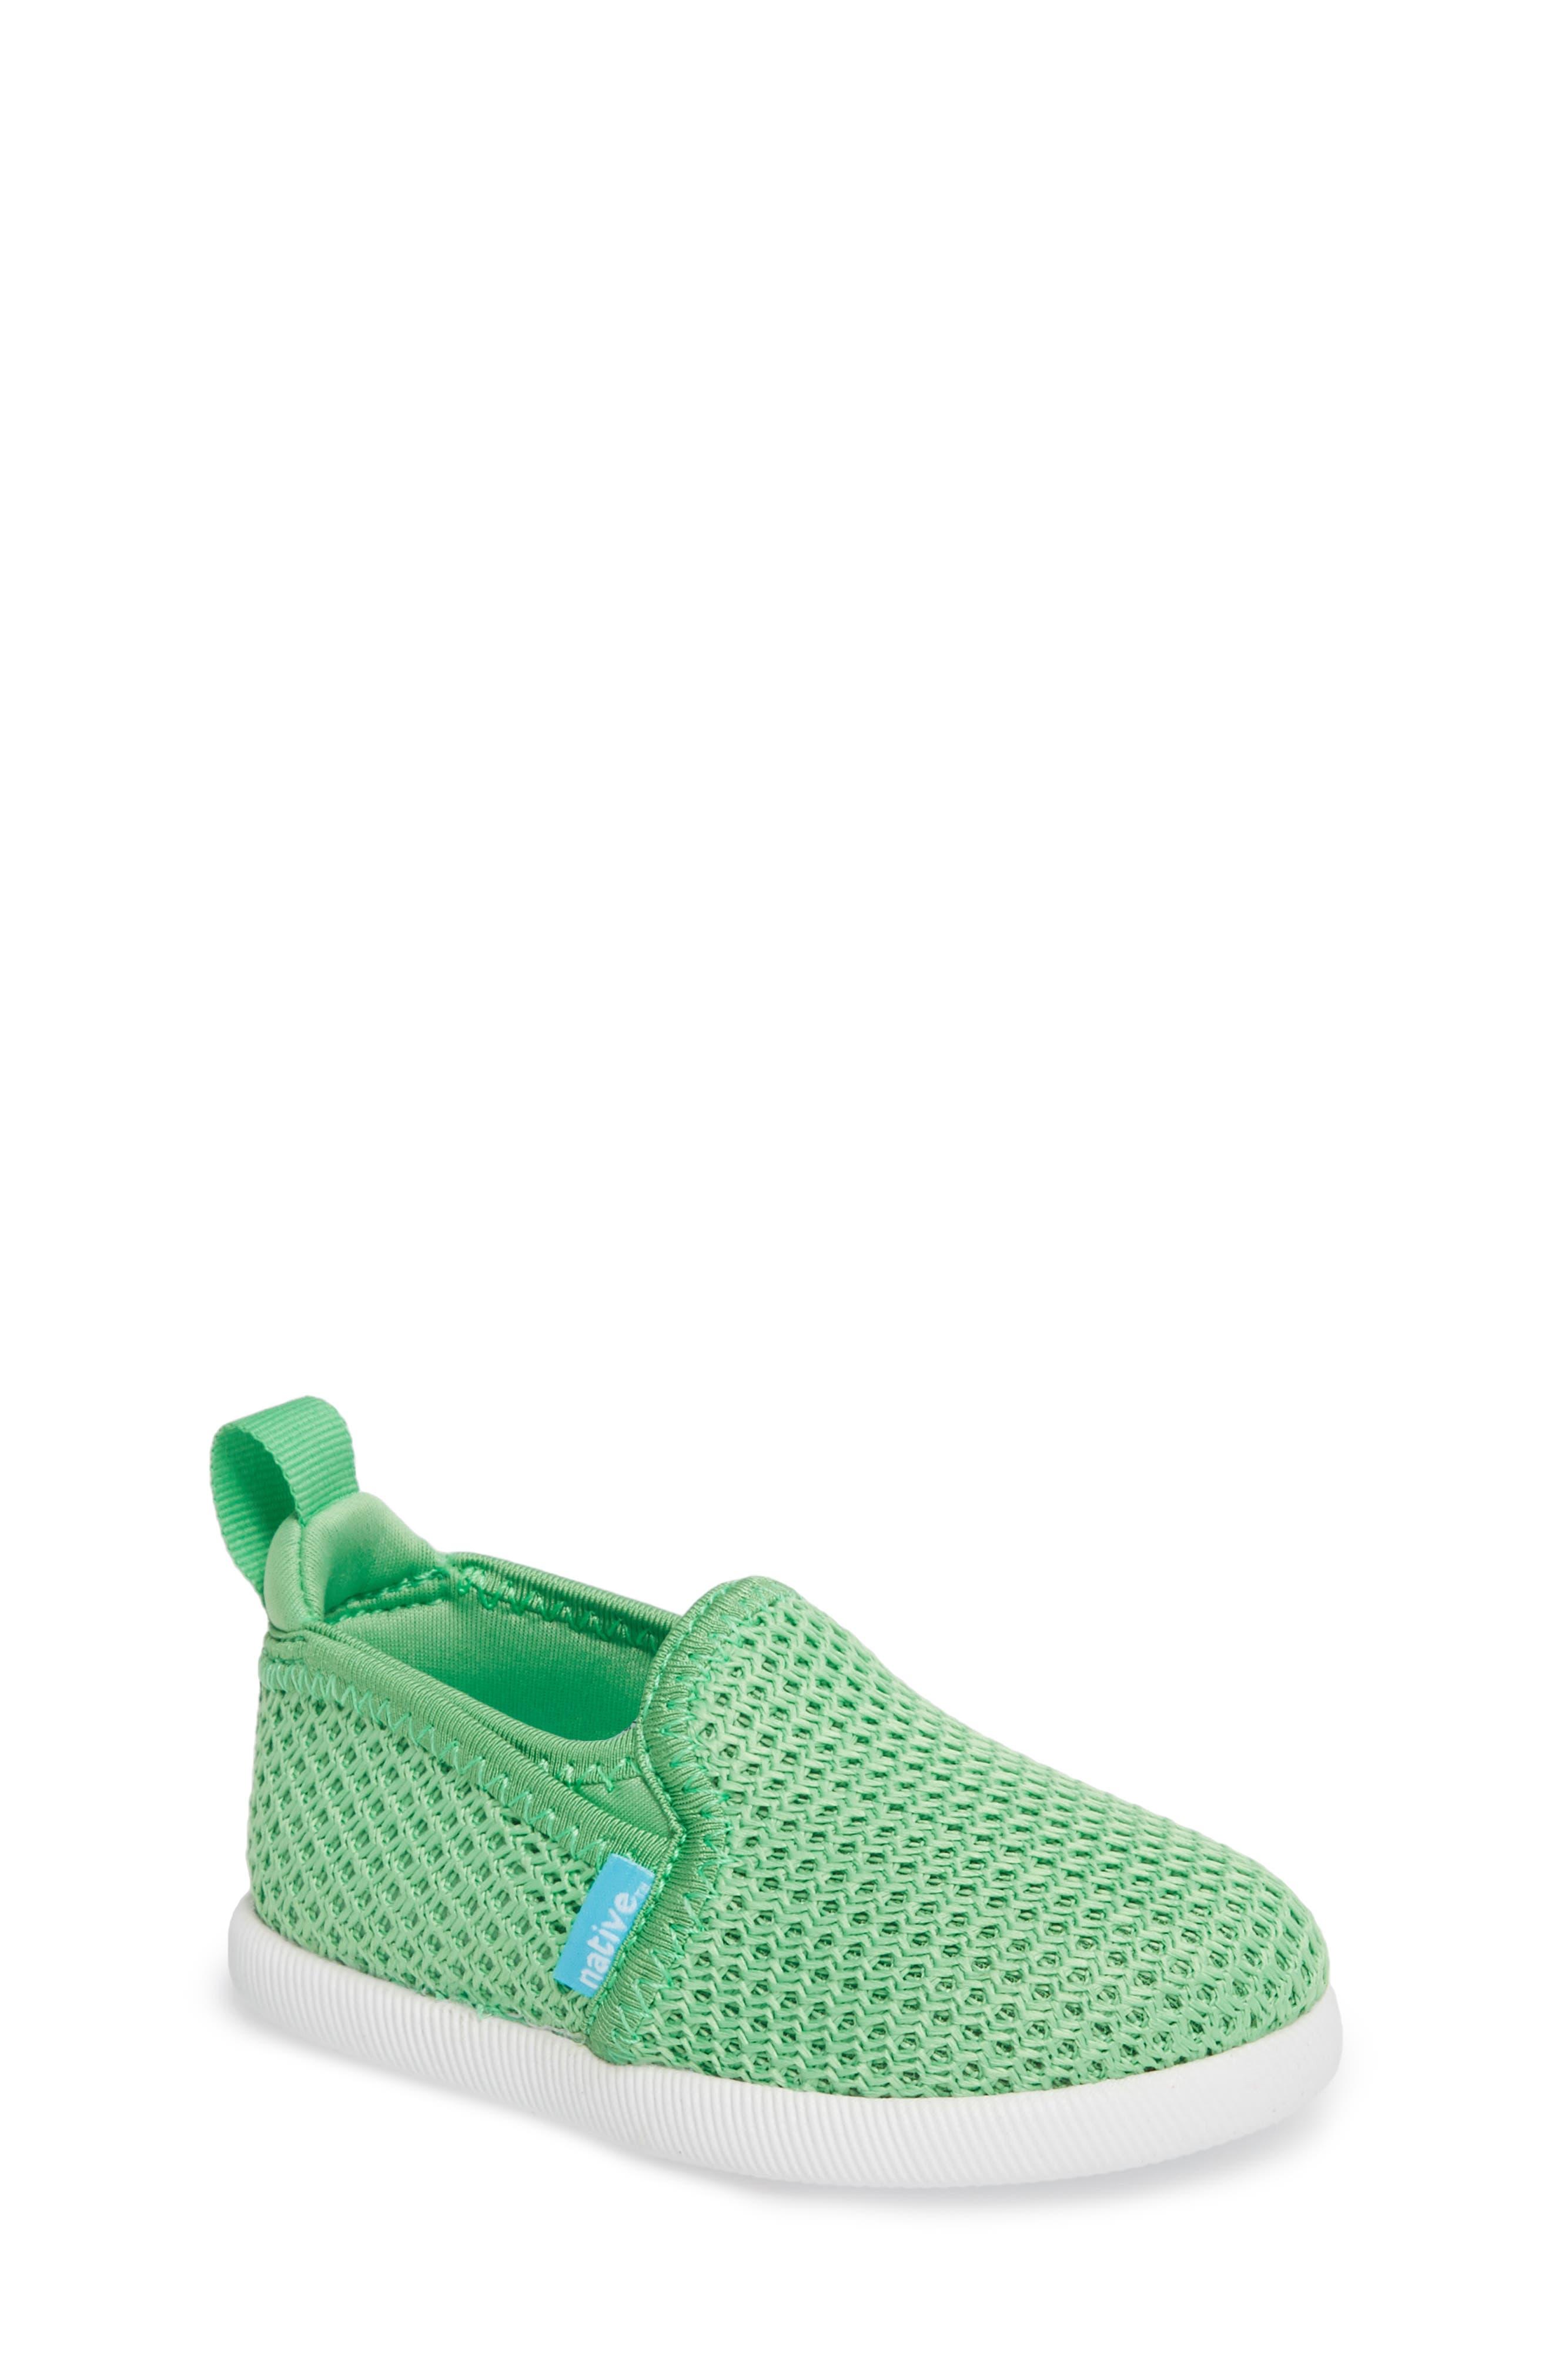 Native Shoes Cruz Woven Slip-On (Walker, Toddler & Little Kid)